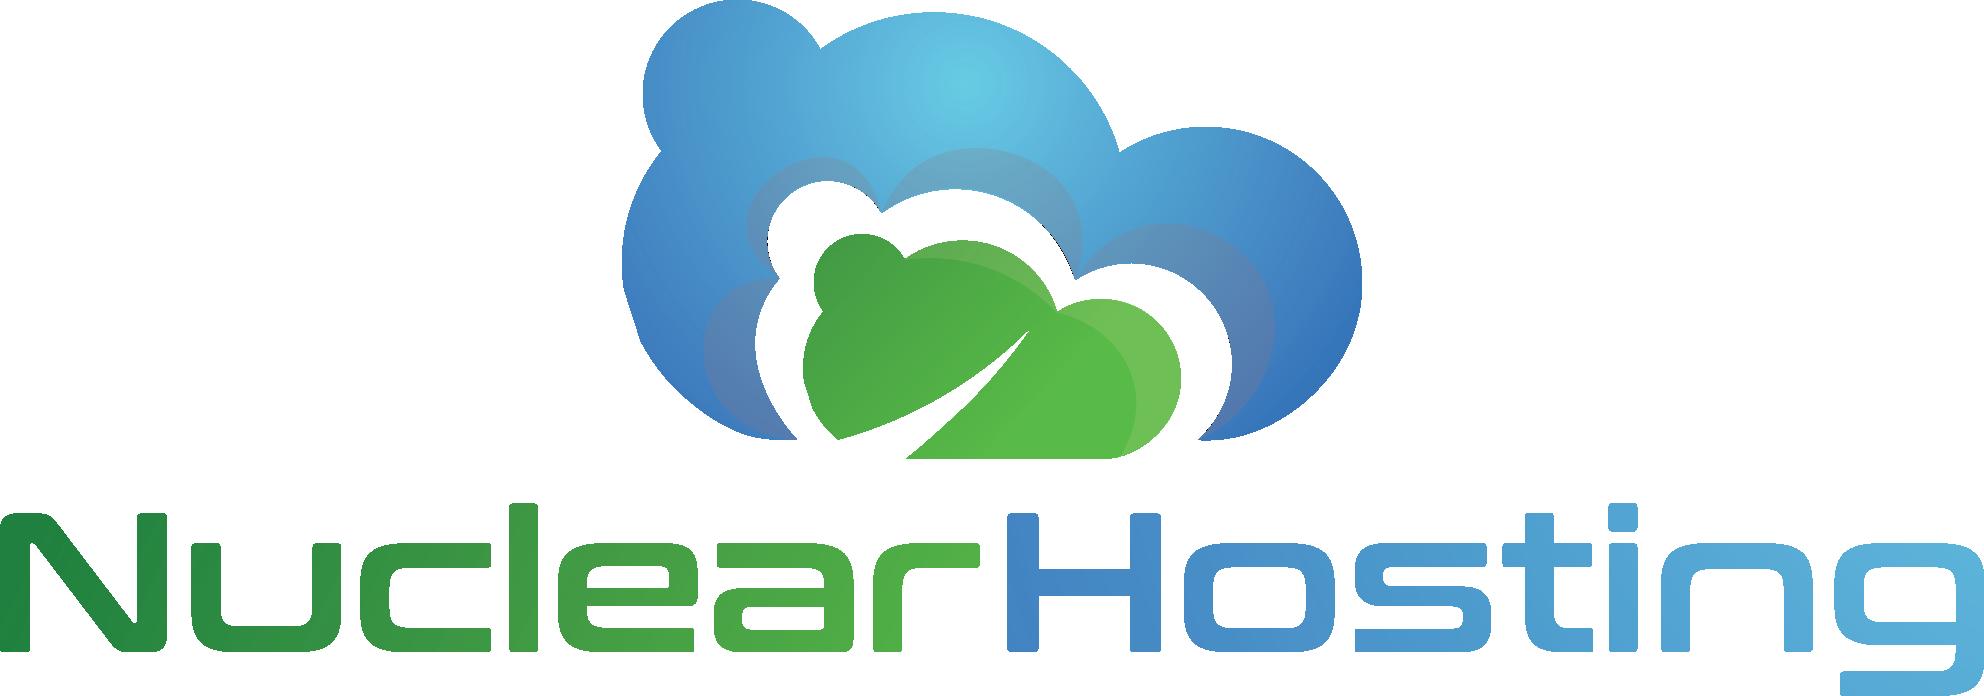 Nuclear.Hosting - Fair & Affordable Web Hosting Services